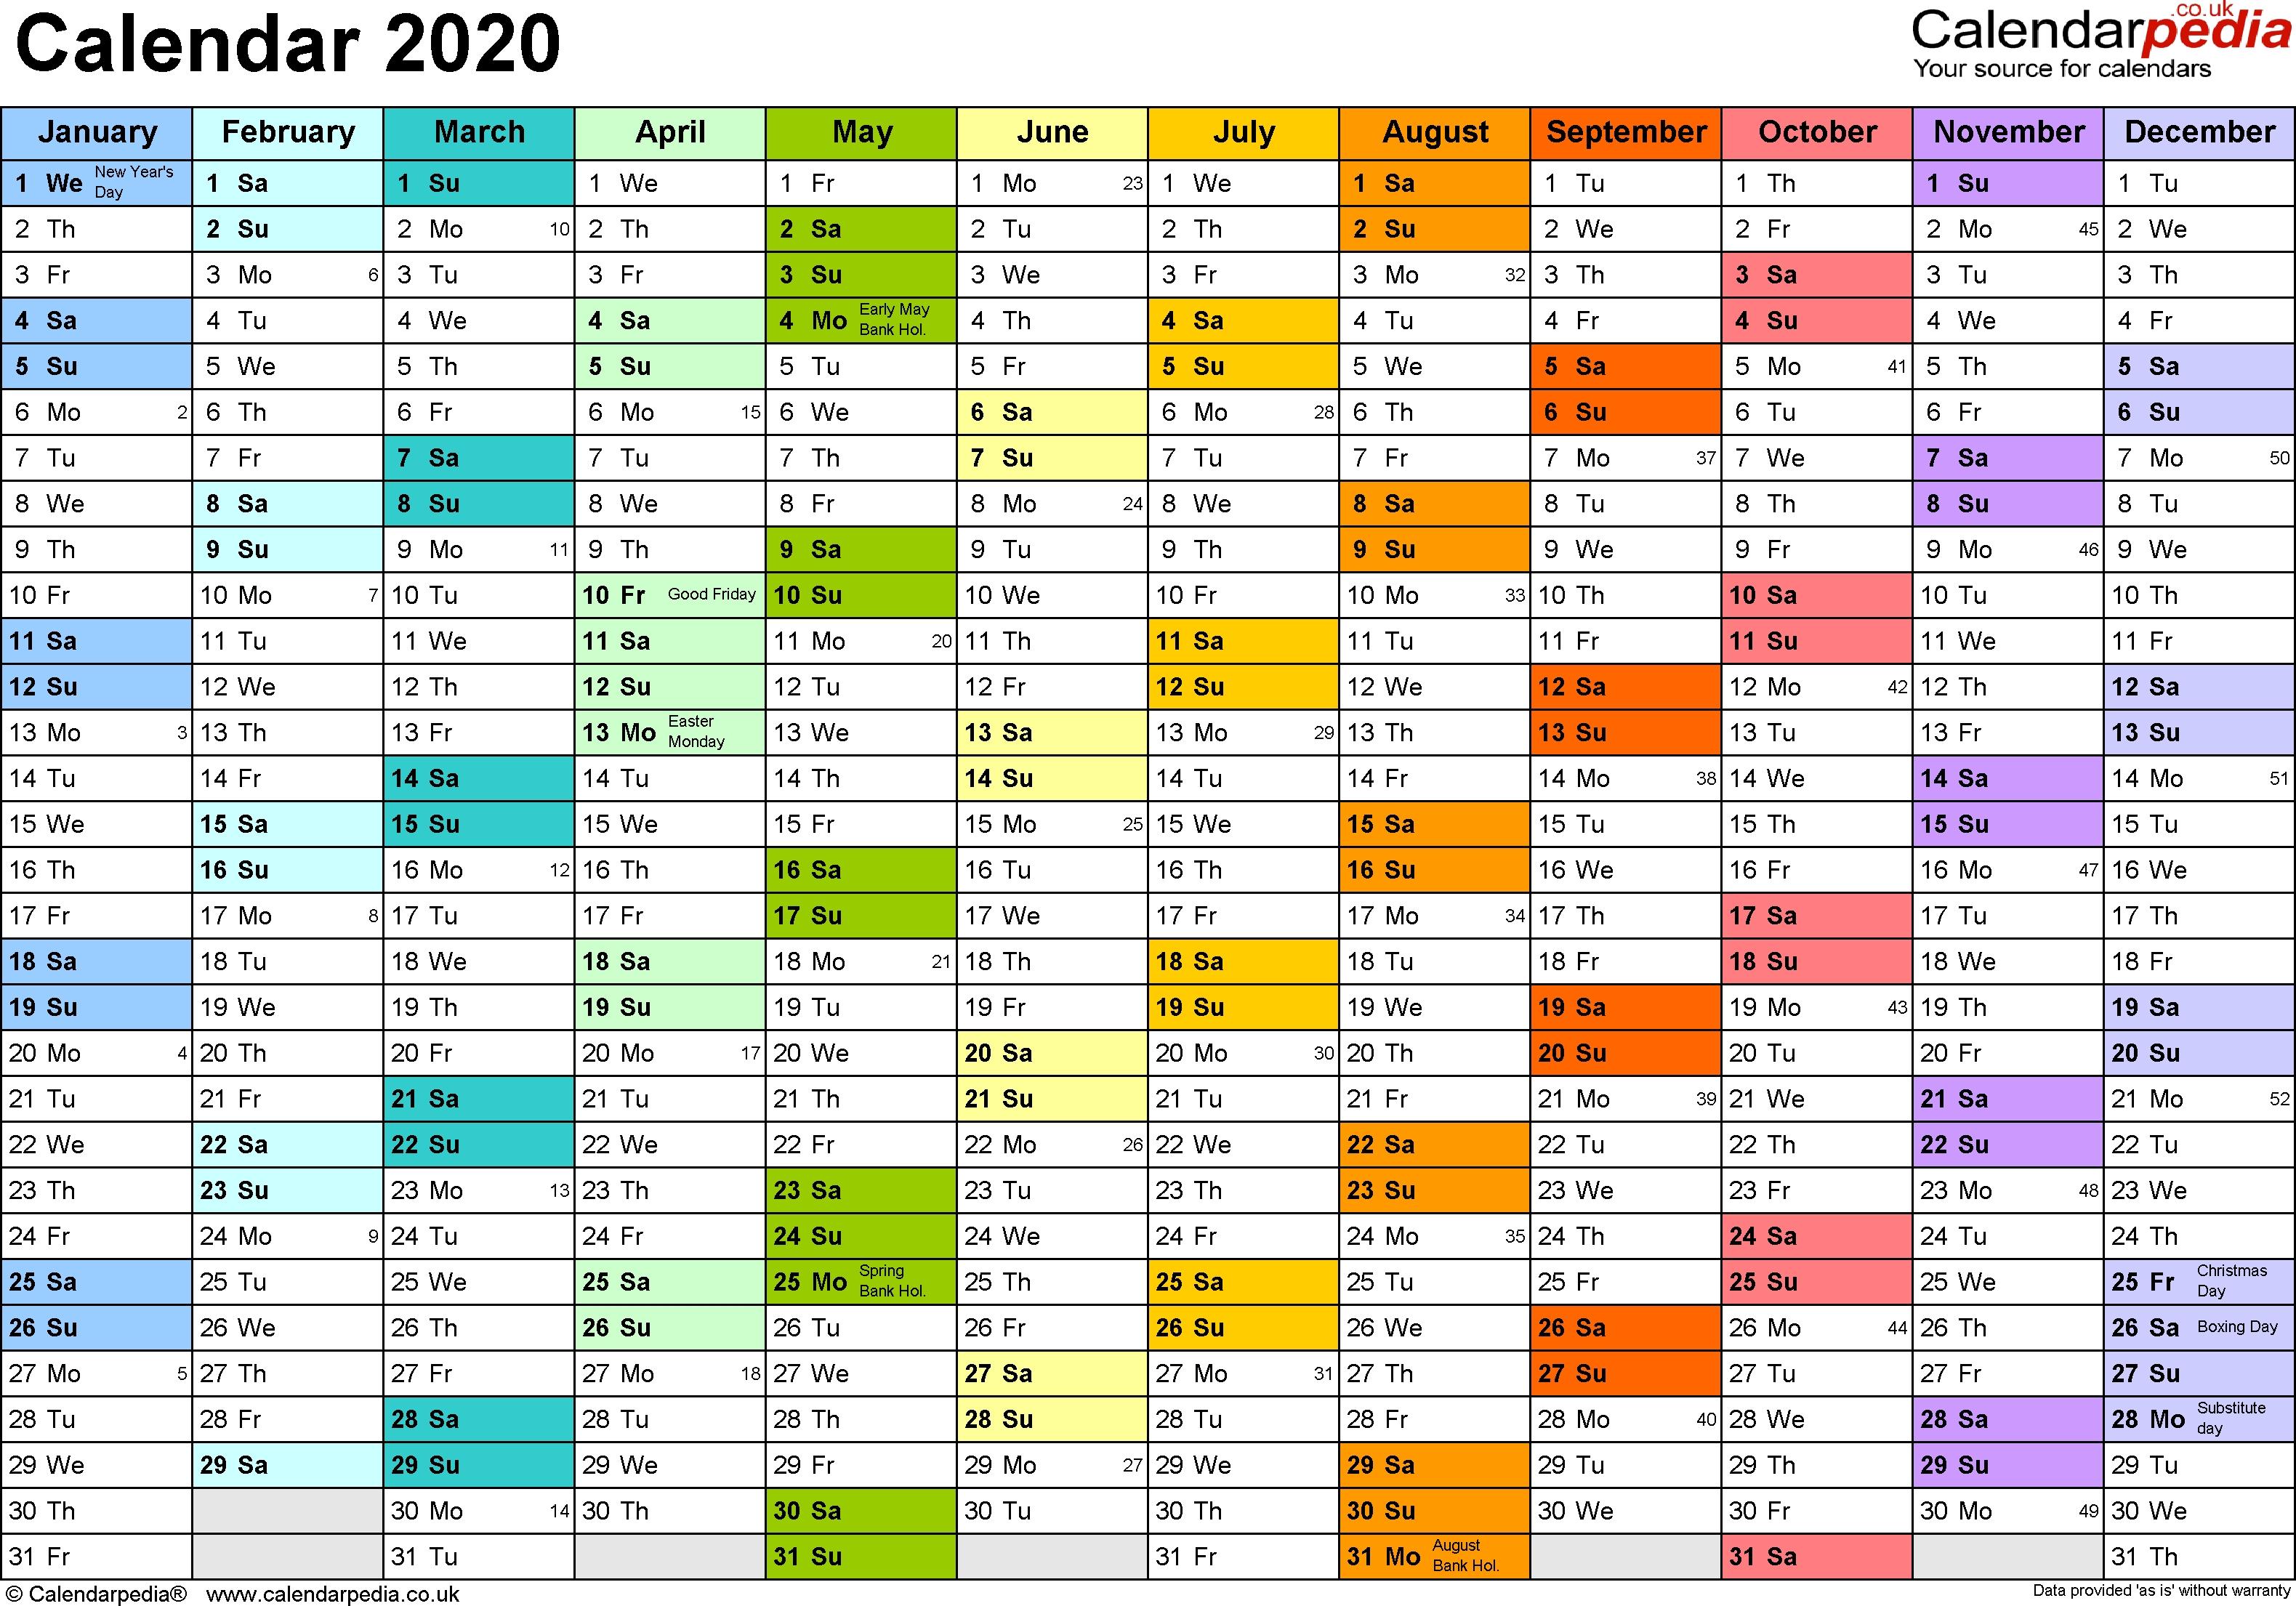 Calendar 2020 (Uk) - 16 Free Printable Word Templates Remarkable 2020 Yearly Calendar Template Word